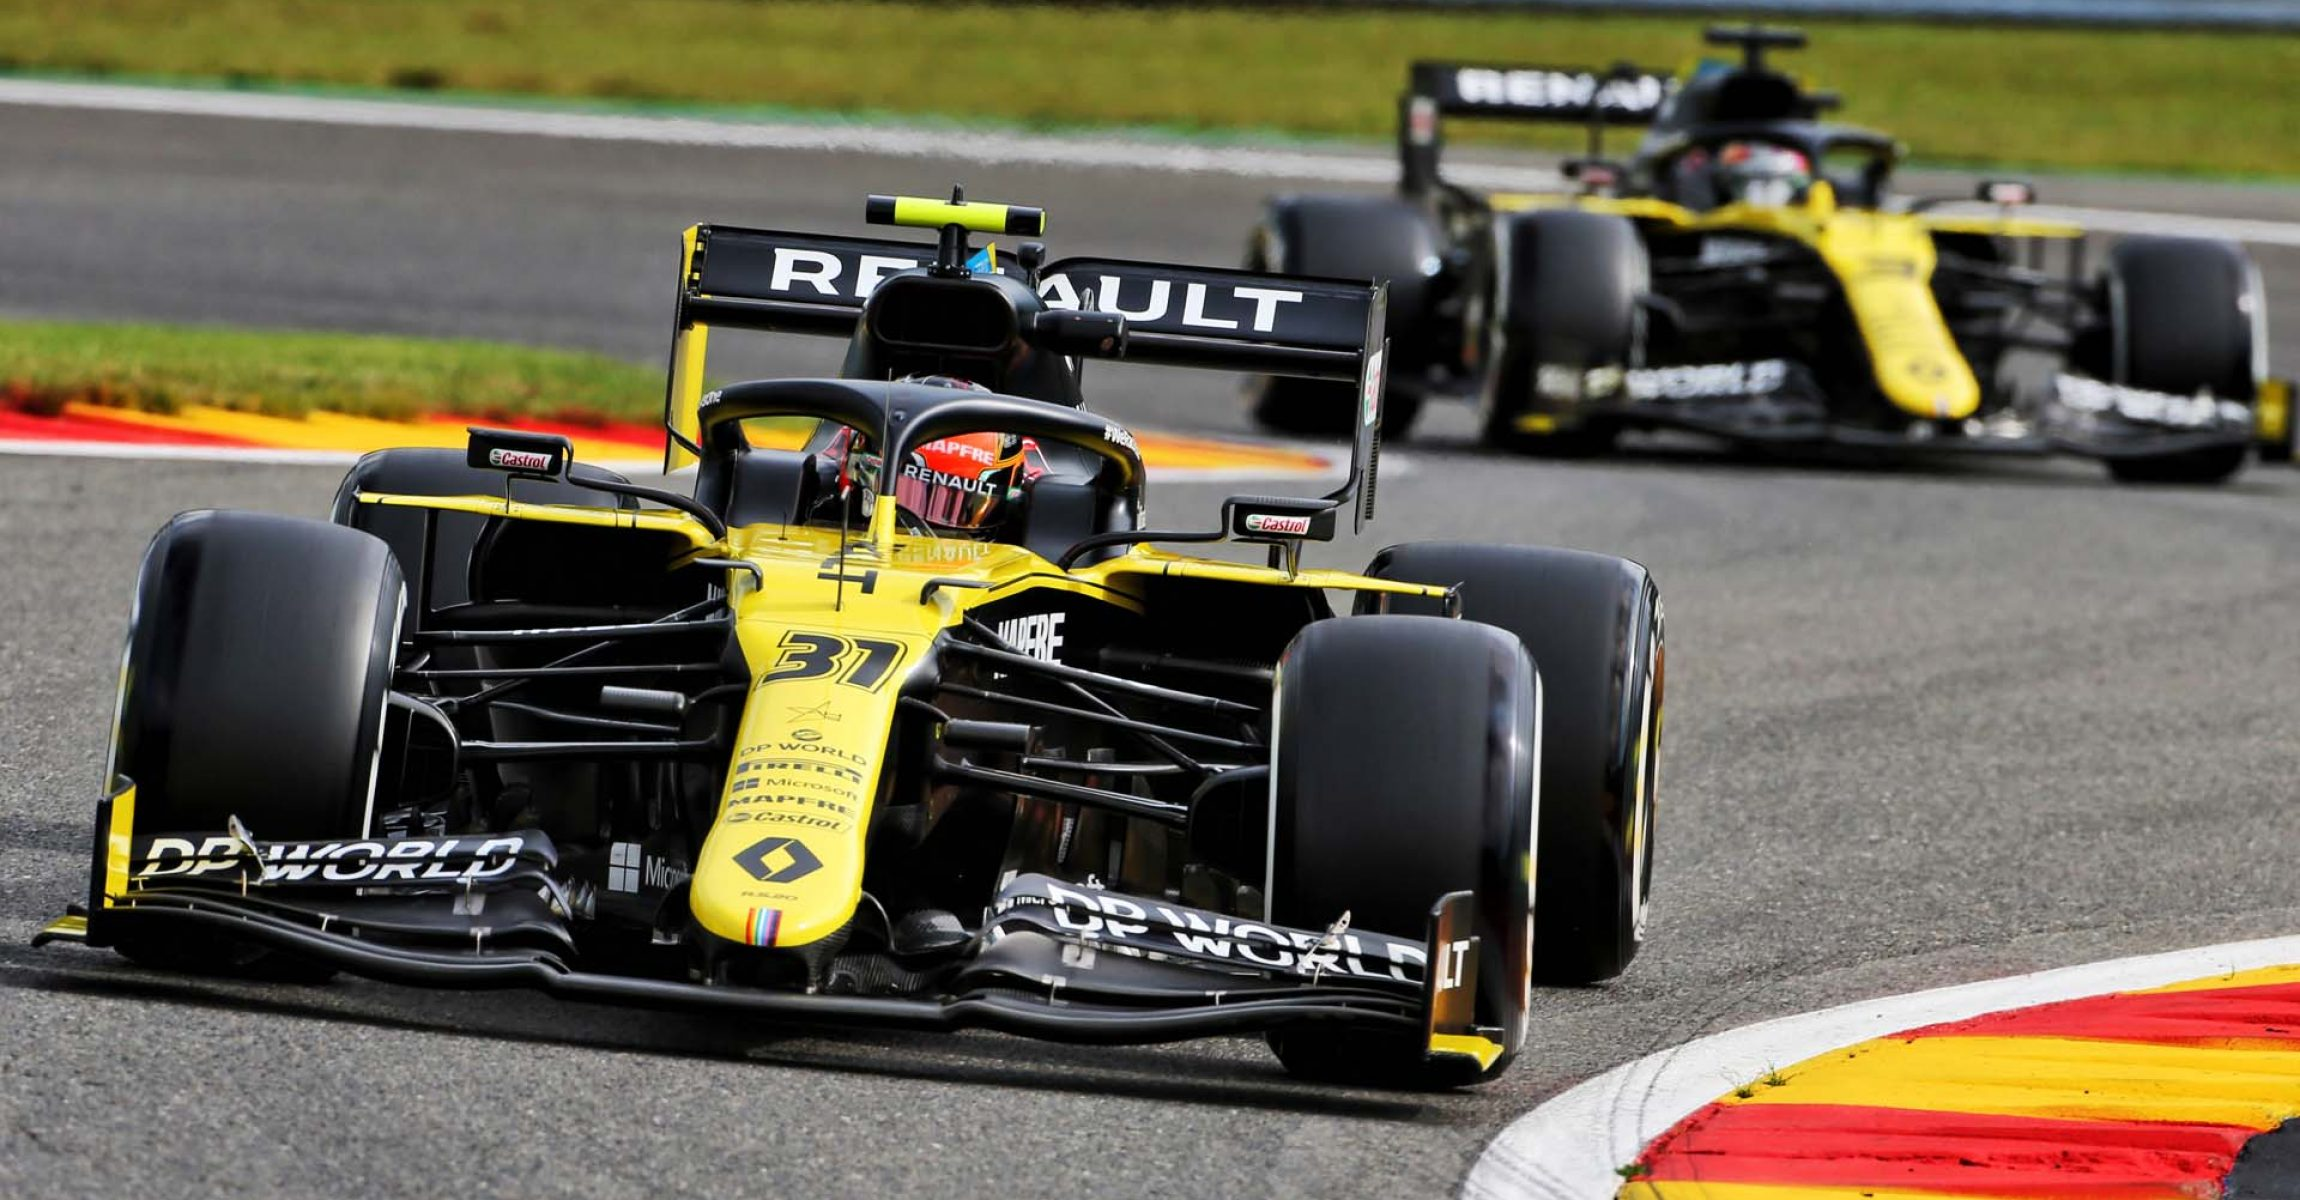 Esteban Ocon (FRA) Renault F1 Team RS20 leads team mate Daniel Ricciardo (AUS) Renault F1 Team RS20. Belgian Grand Prix, Friday 28th August 2020. Spa-Francorchamps, Belgium.